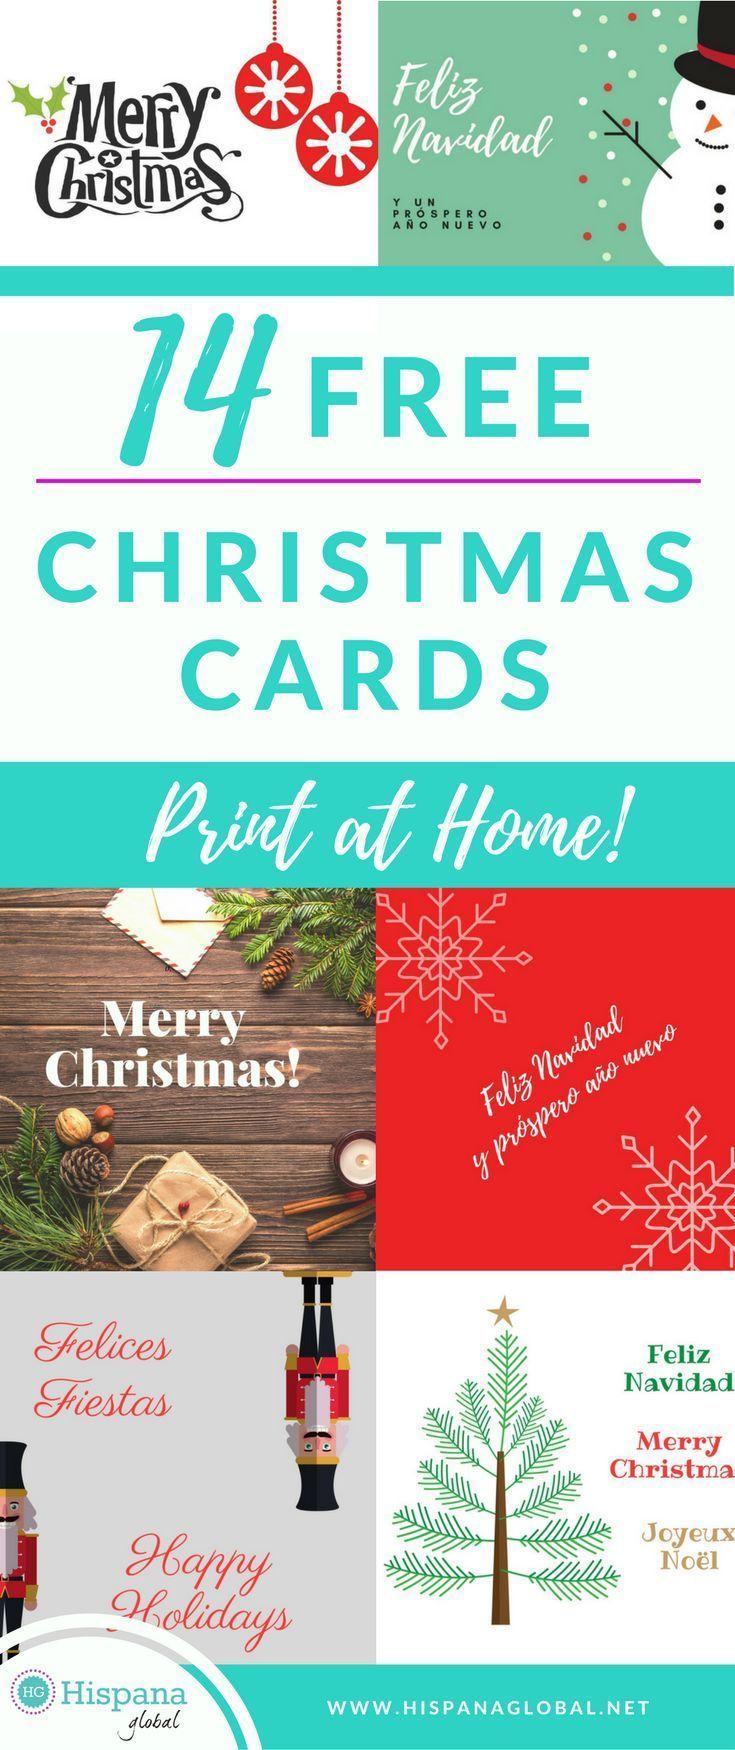 14 Free Christmas Cards You Can Print At Home   Hispana Global ...